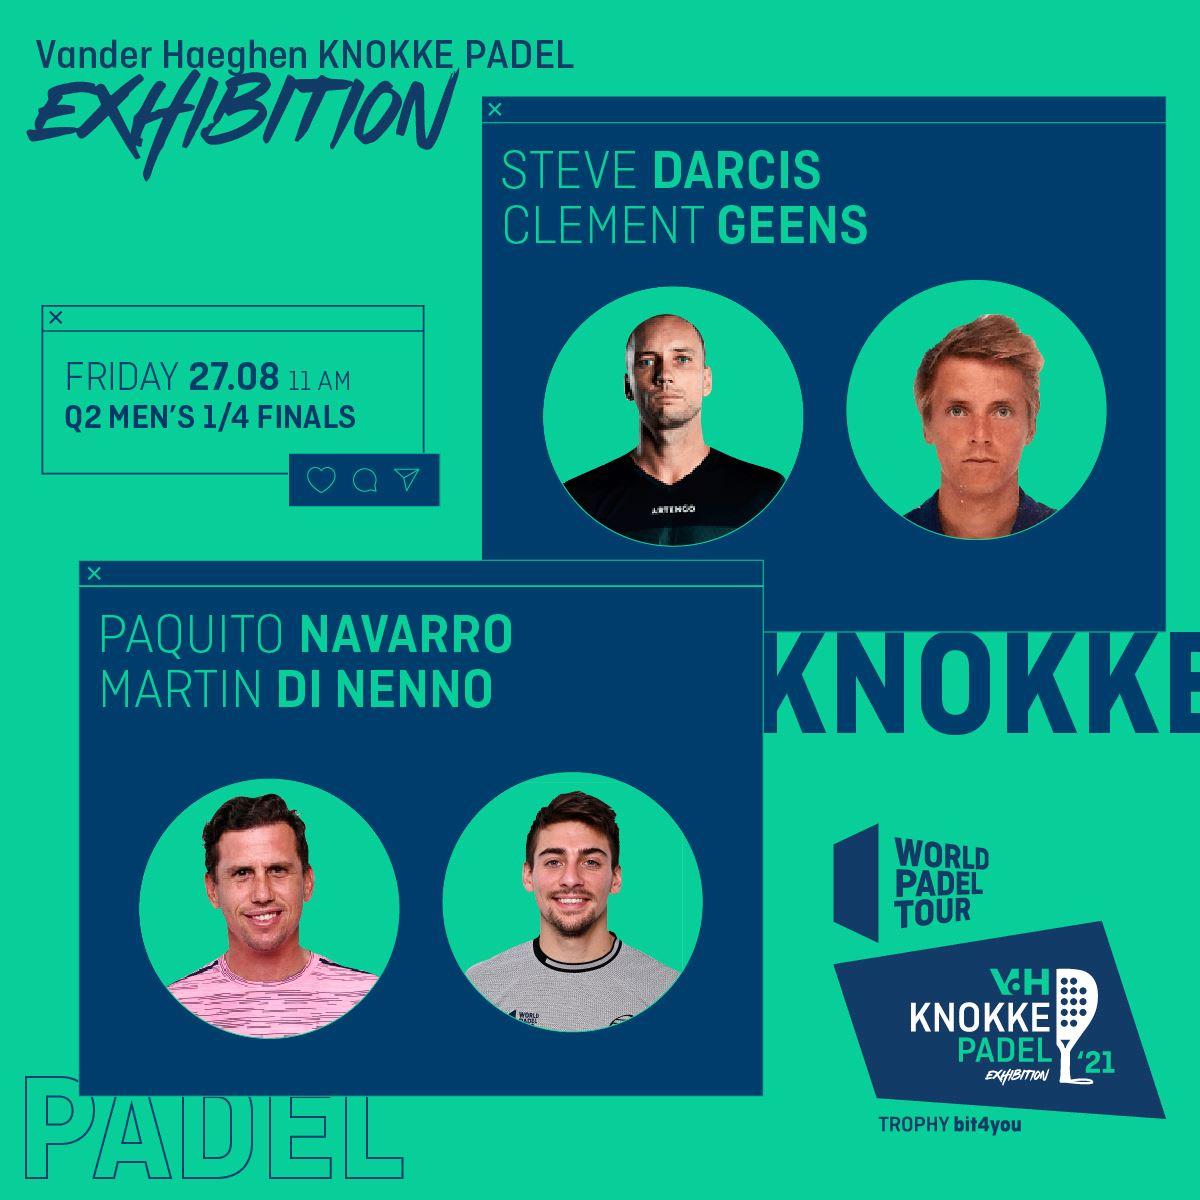 World Padel Tour Knokke darcis